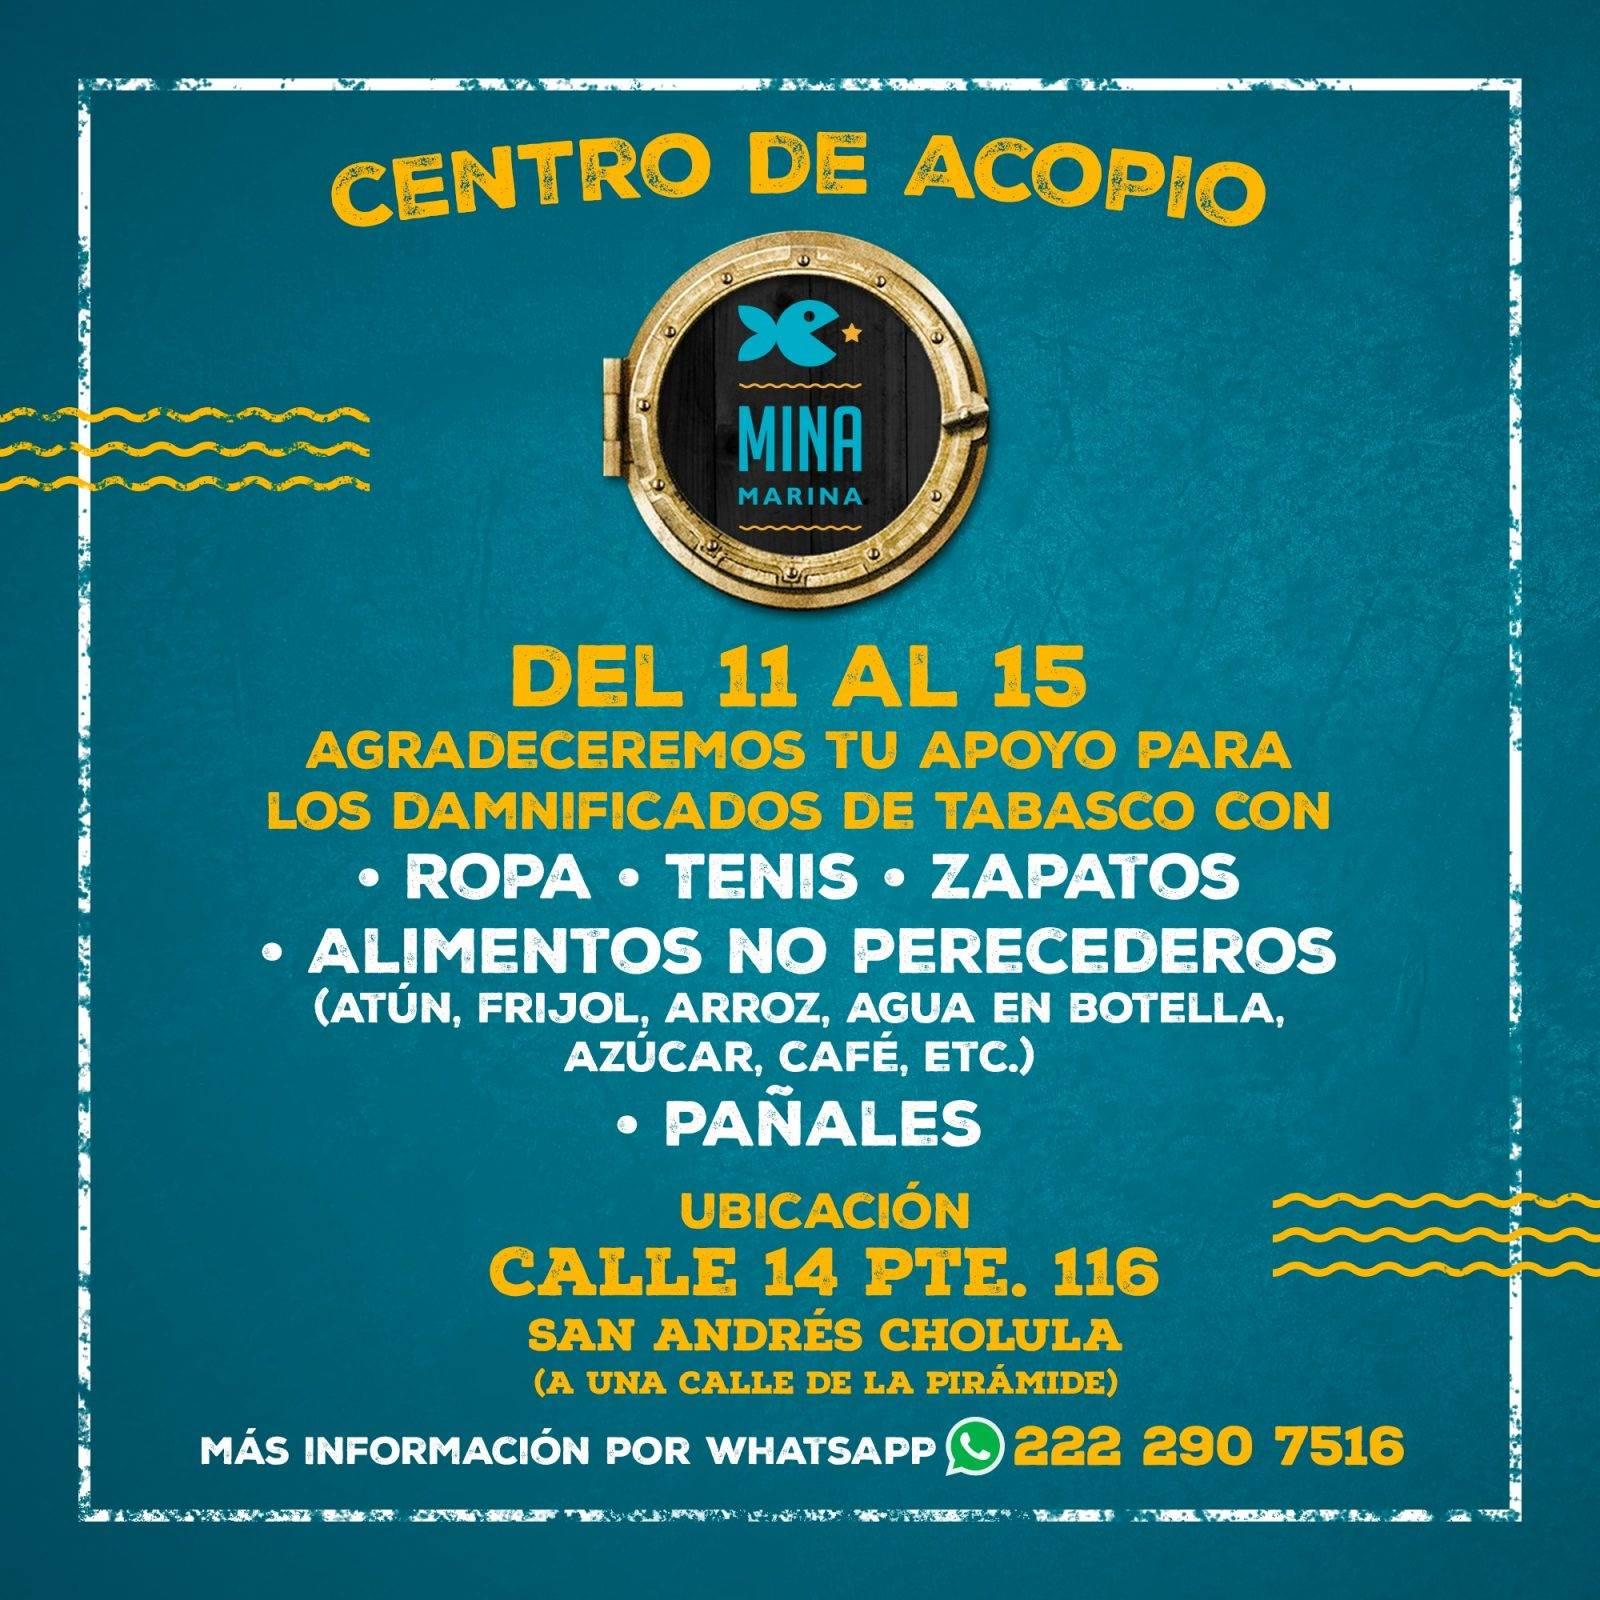 Centro de Acopio ubicado en San Andrés Cholula.